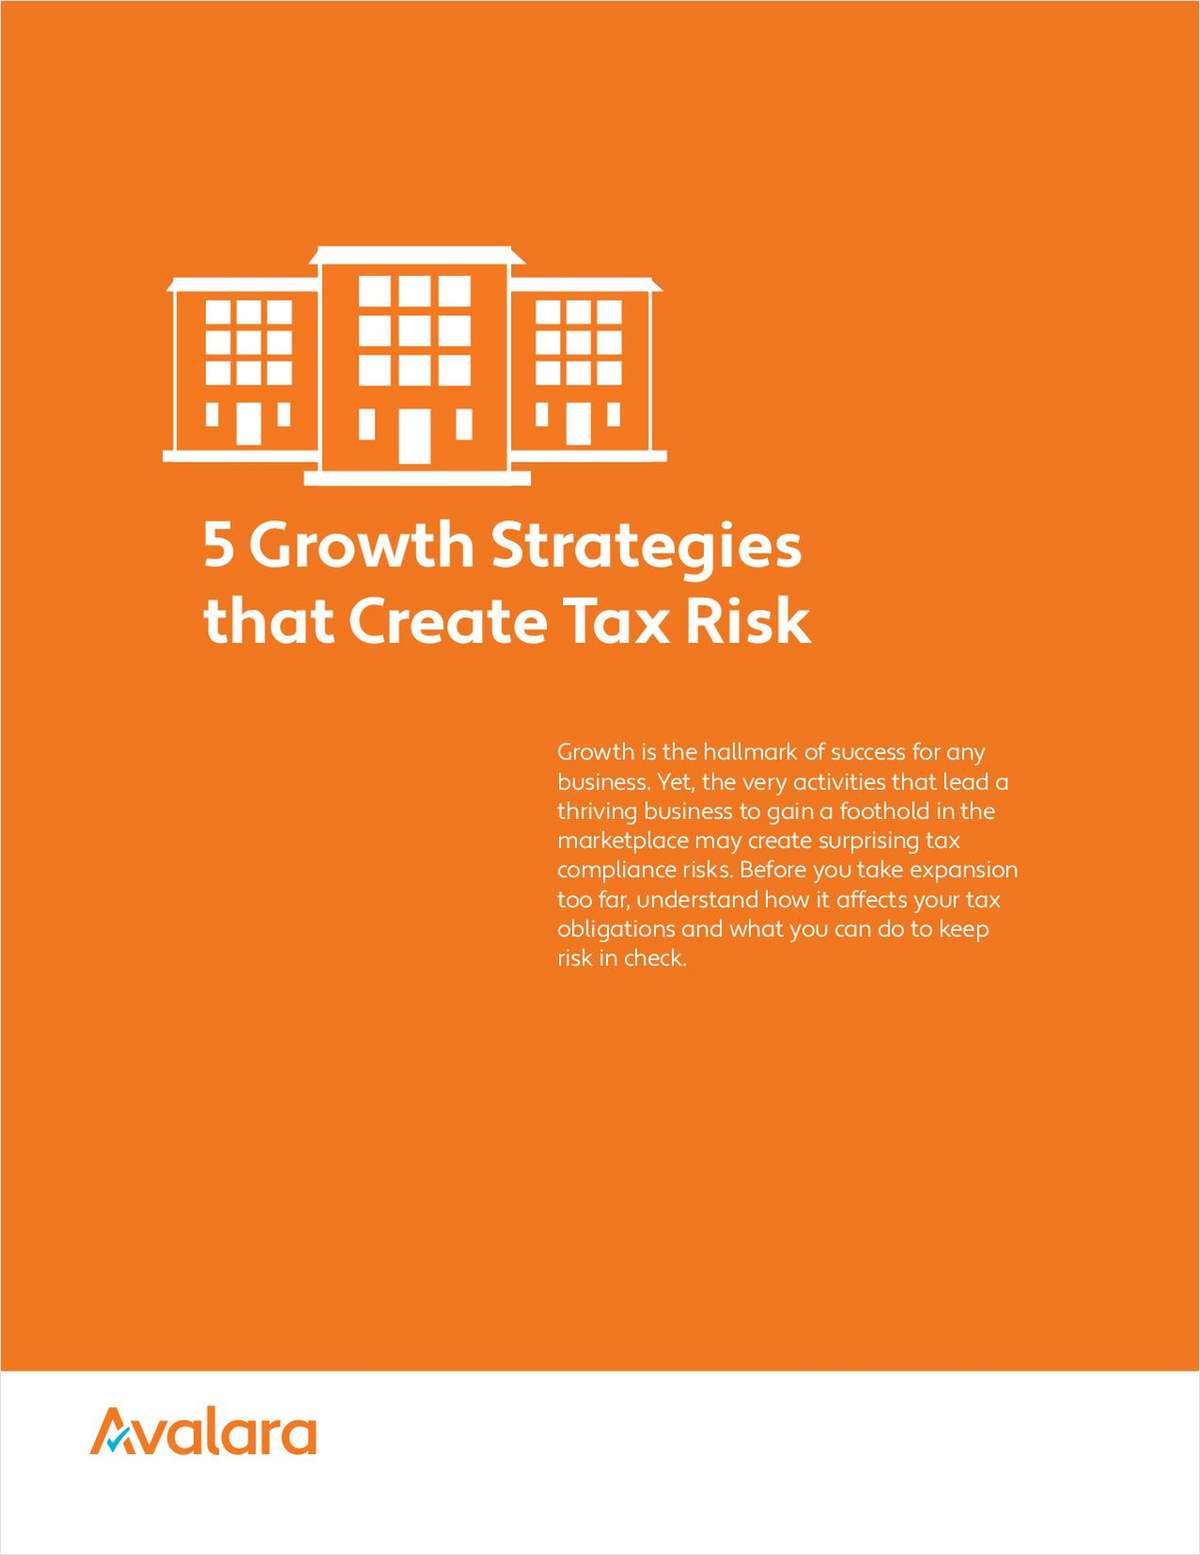 5 Growth Strategies that Create Tax Risk